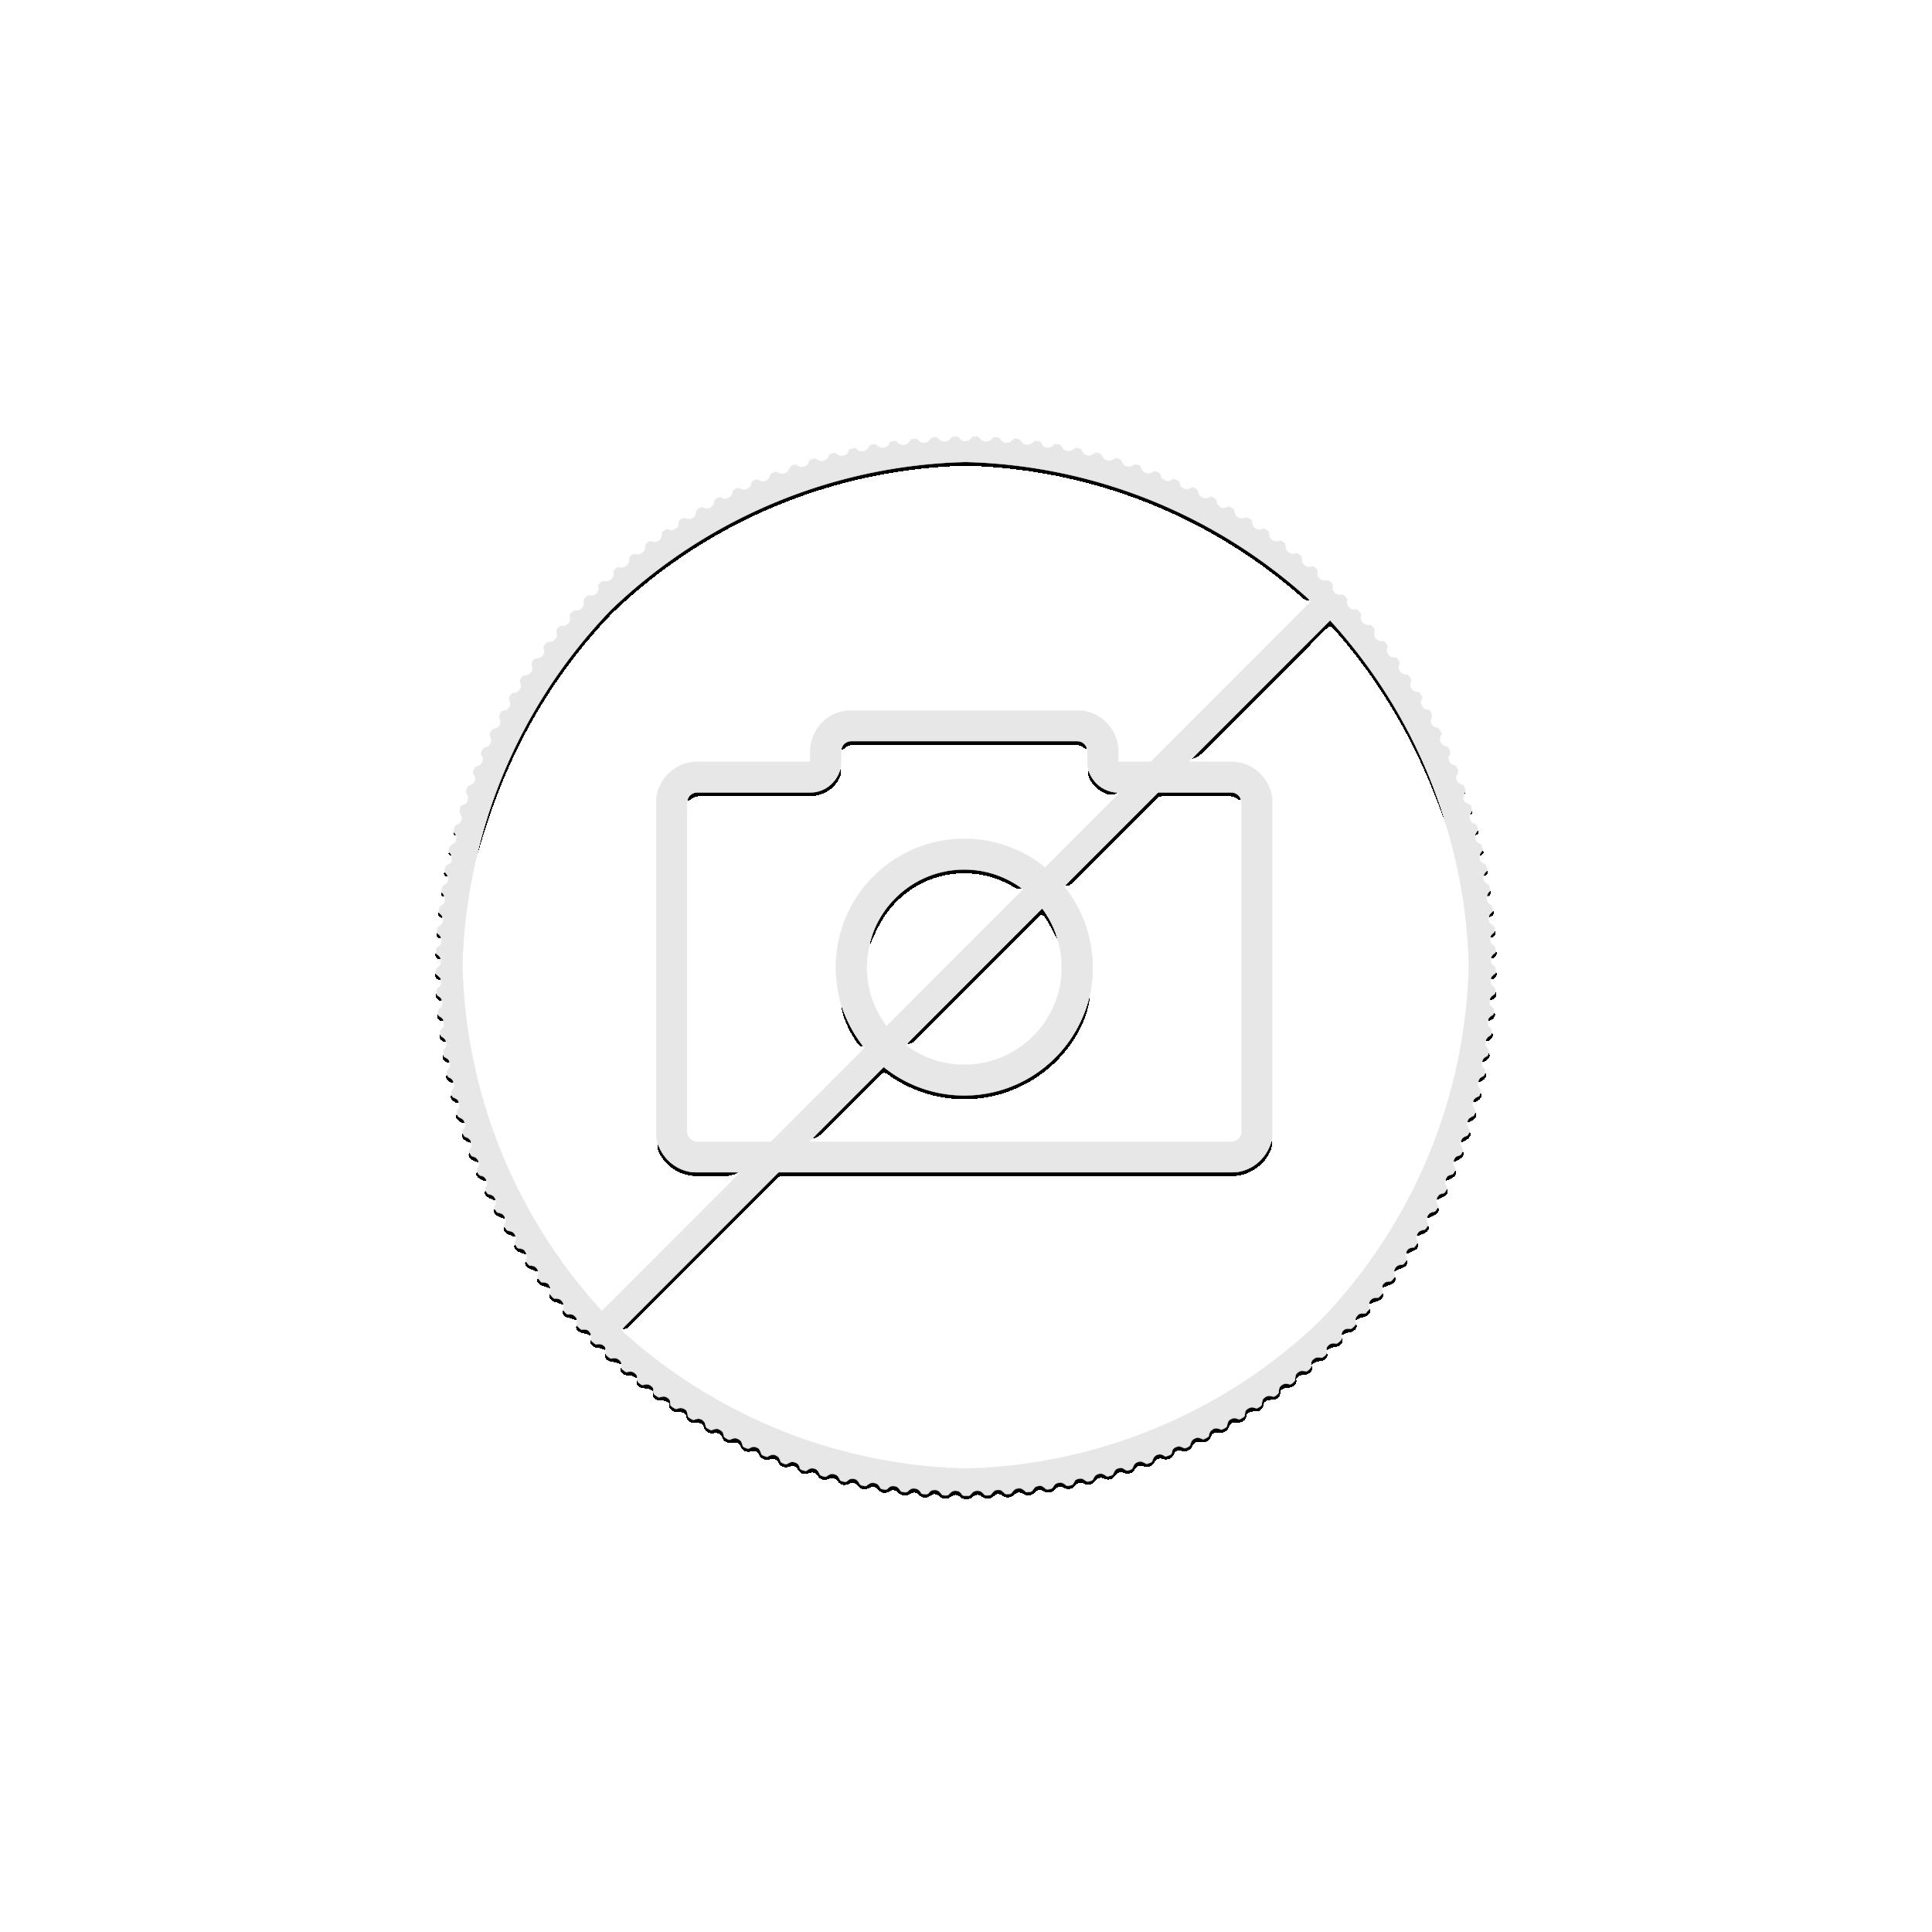 1 Troy ounce zilveren munt Philharmoniker 2017 Gold Plated achterzijde